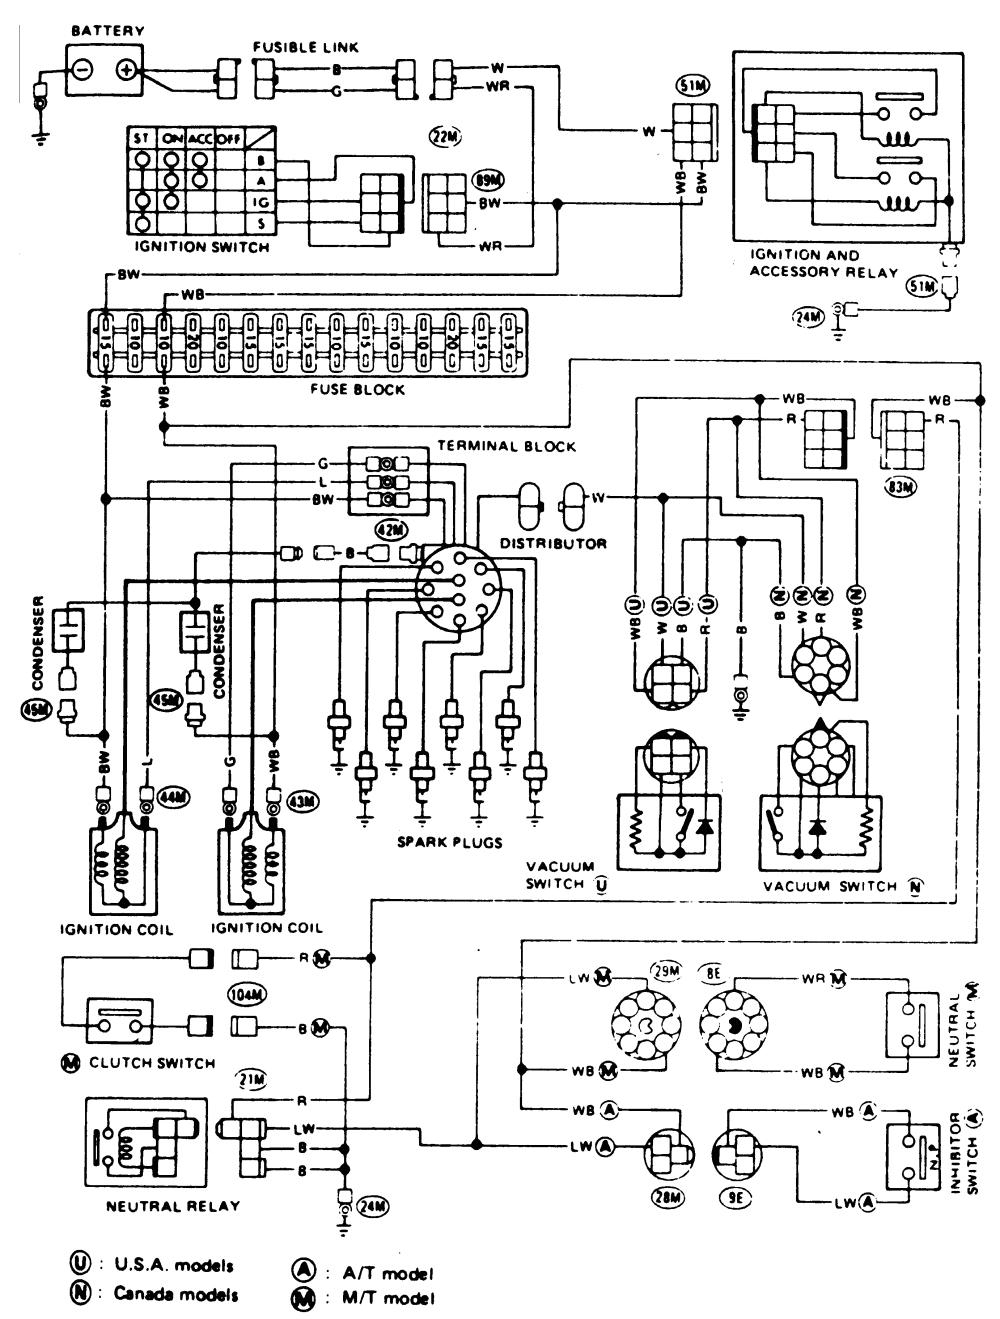 89 240sx fuse diagram wiring diagram schemes 1994 nissan 240sx fuse diagram under hood nissan 240sx